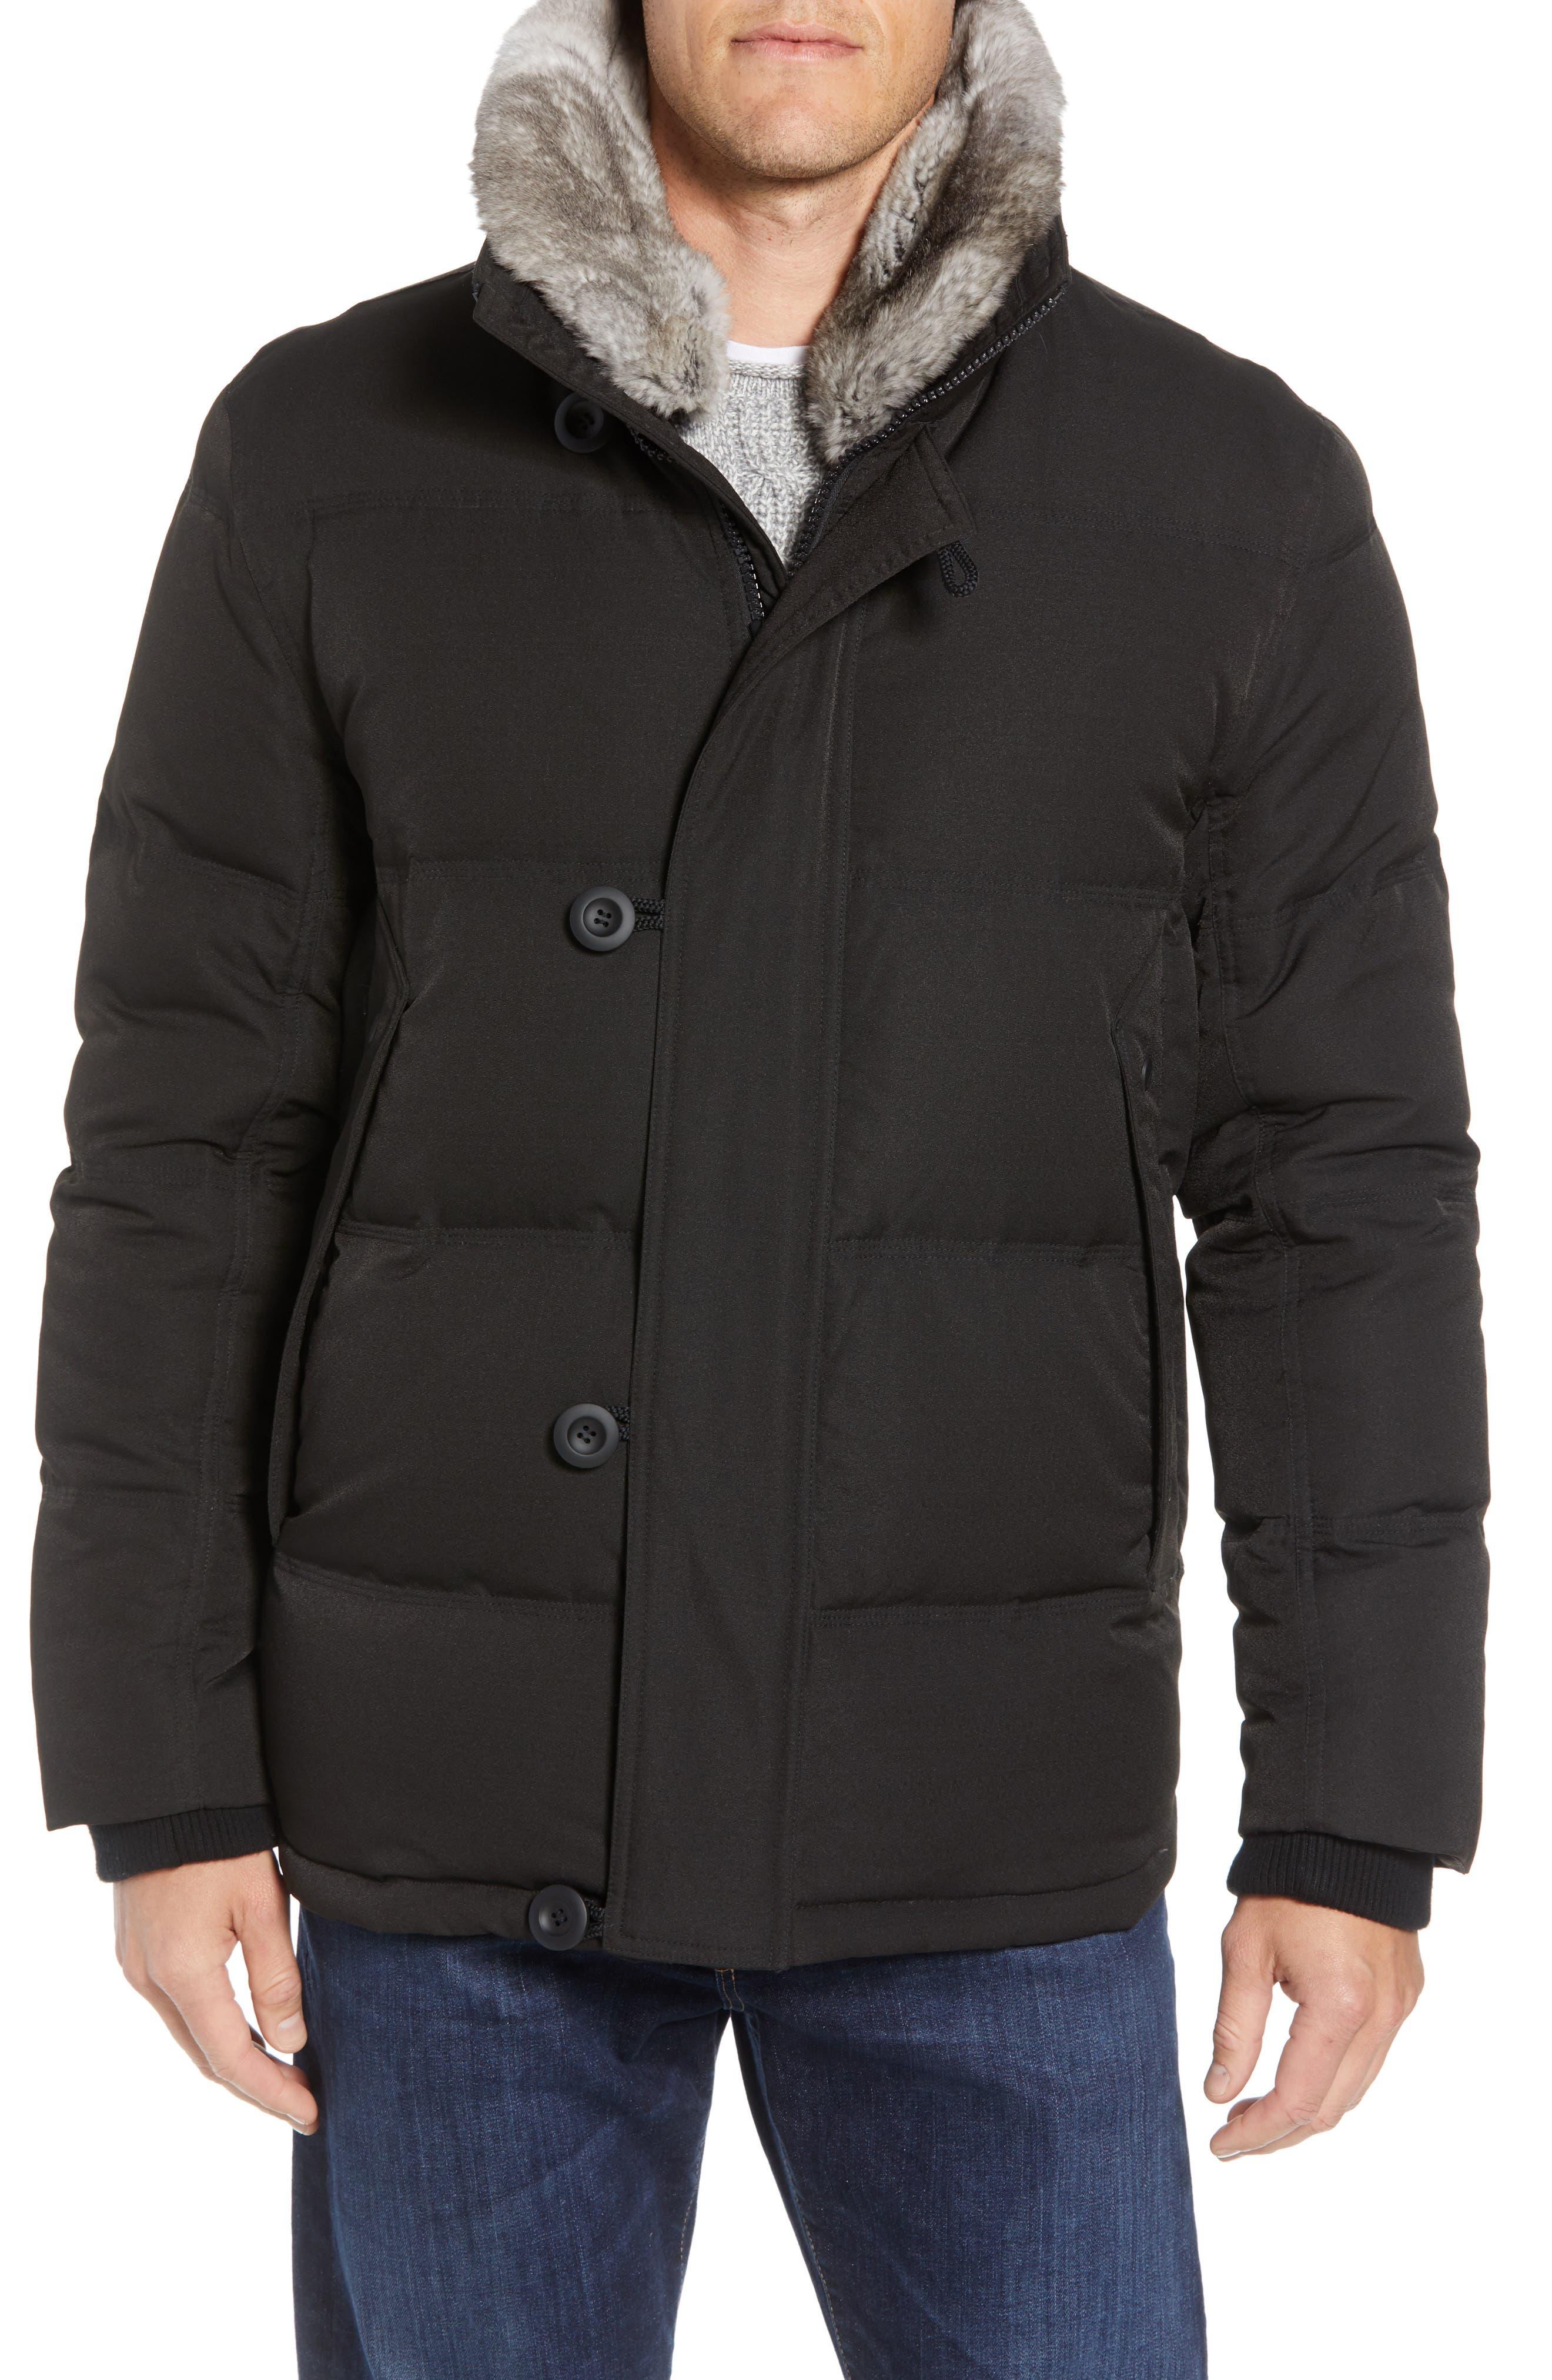 Bryant Genuine Rabbit Fur Trim Down Jacket,                             Main thumbnail 1, color,                             BLACK